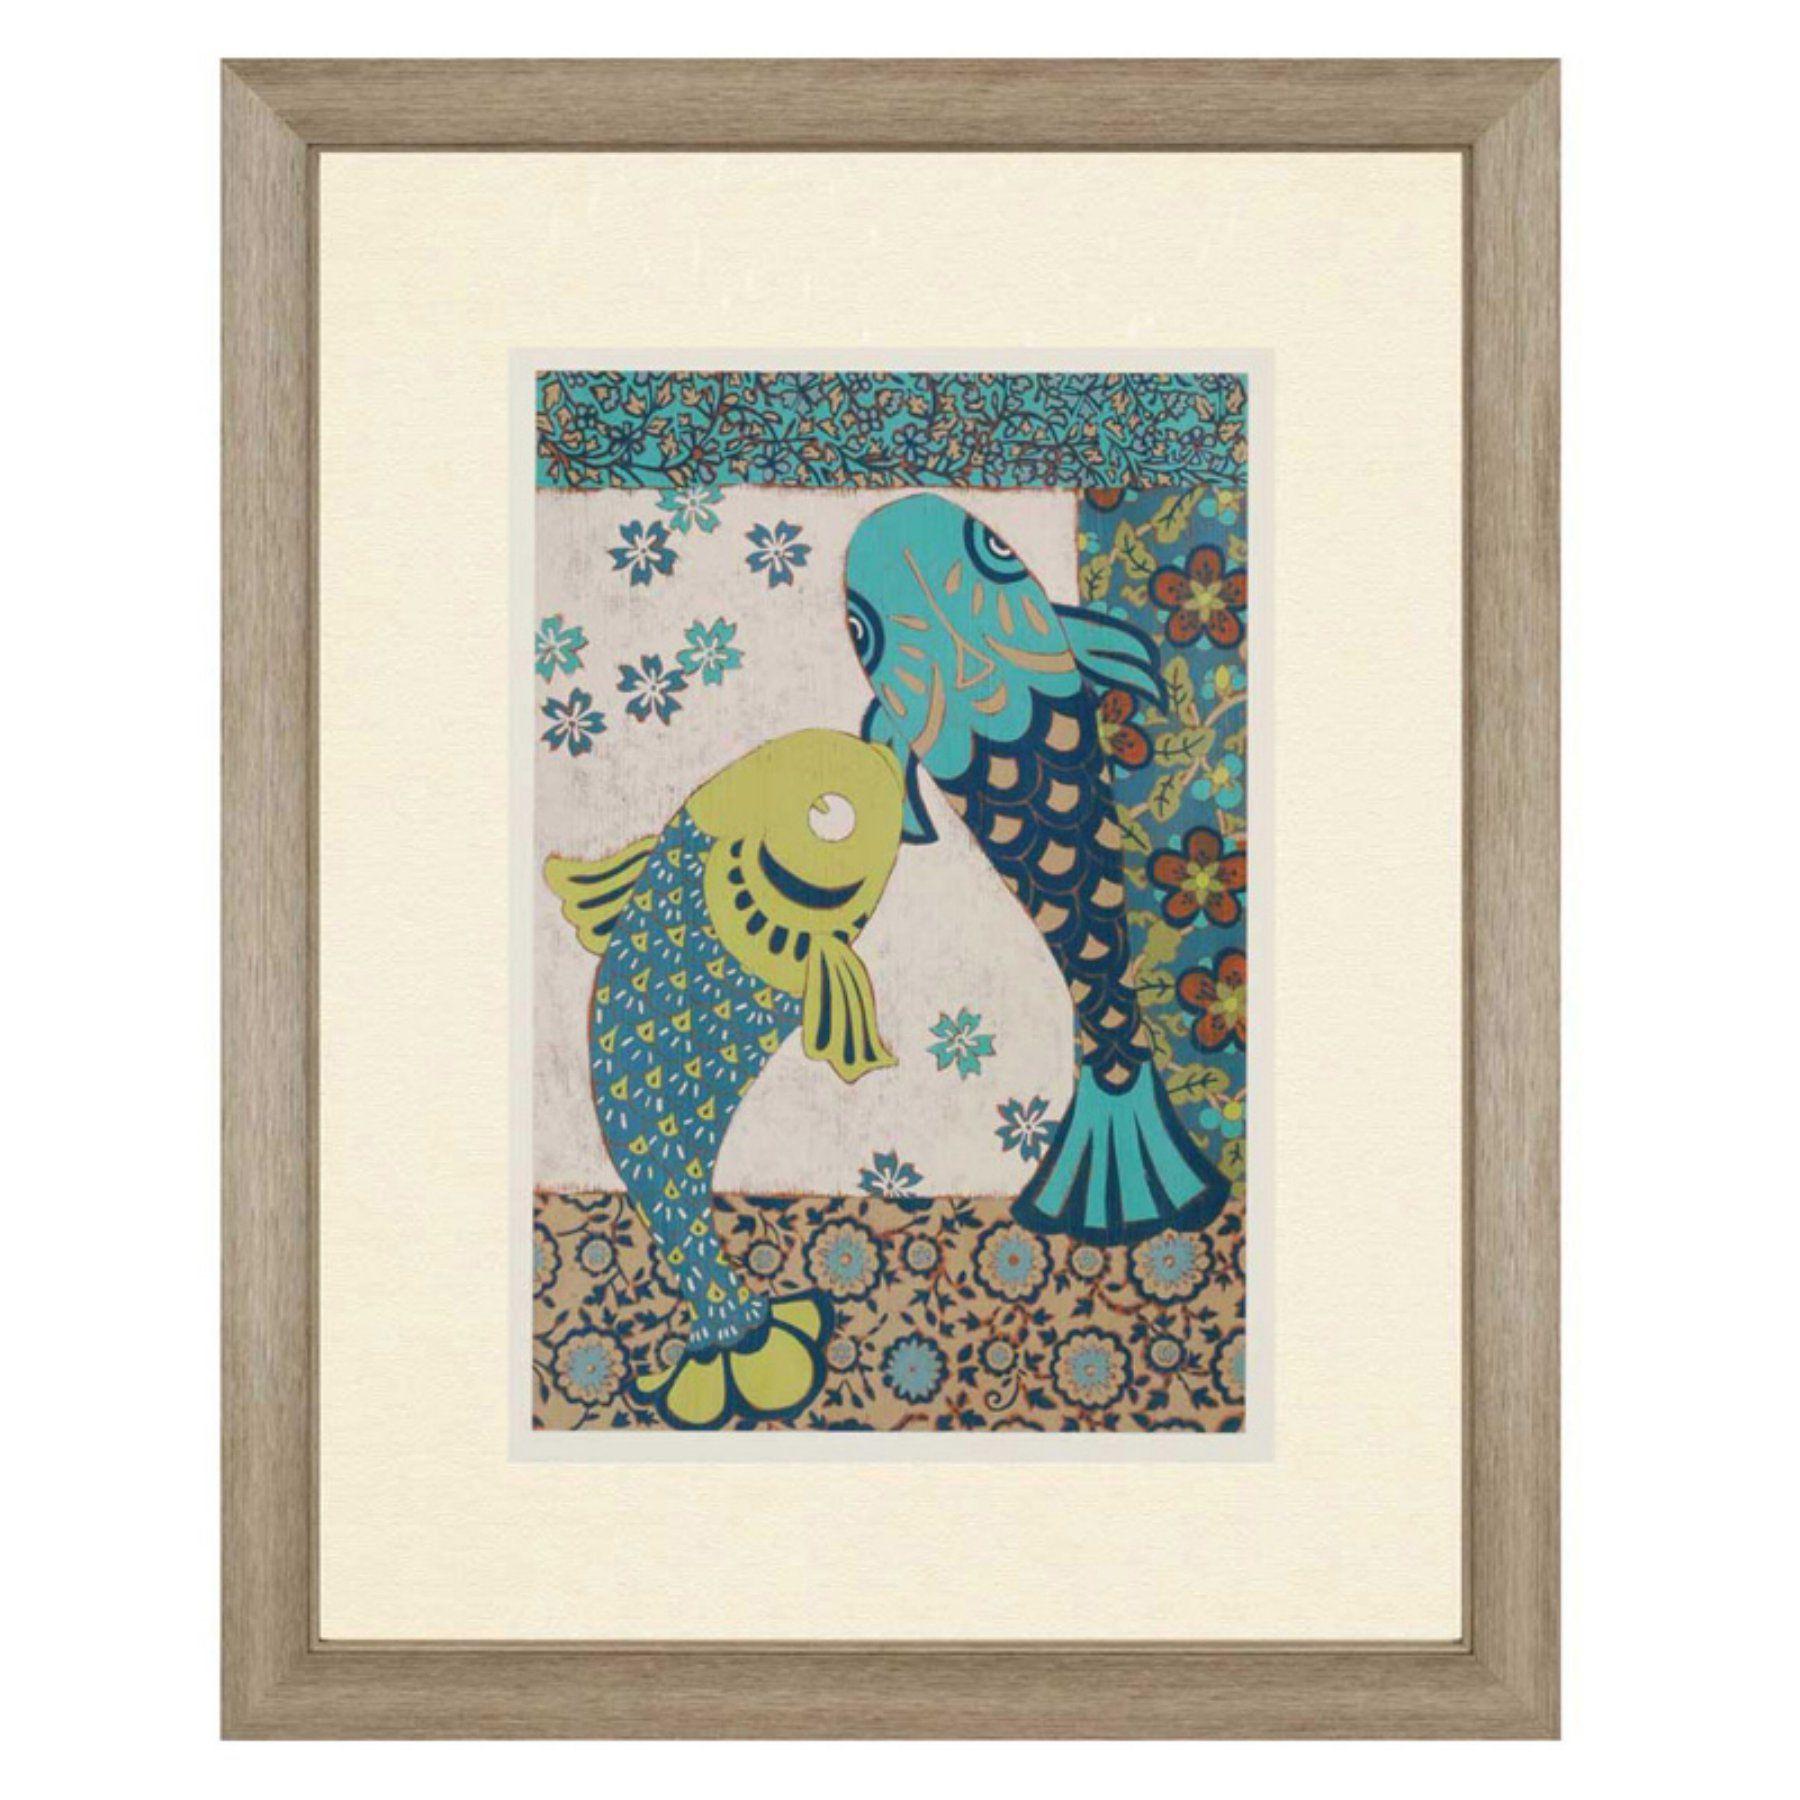 Paragon decor koi ornament ii framed wall art koi and products